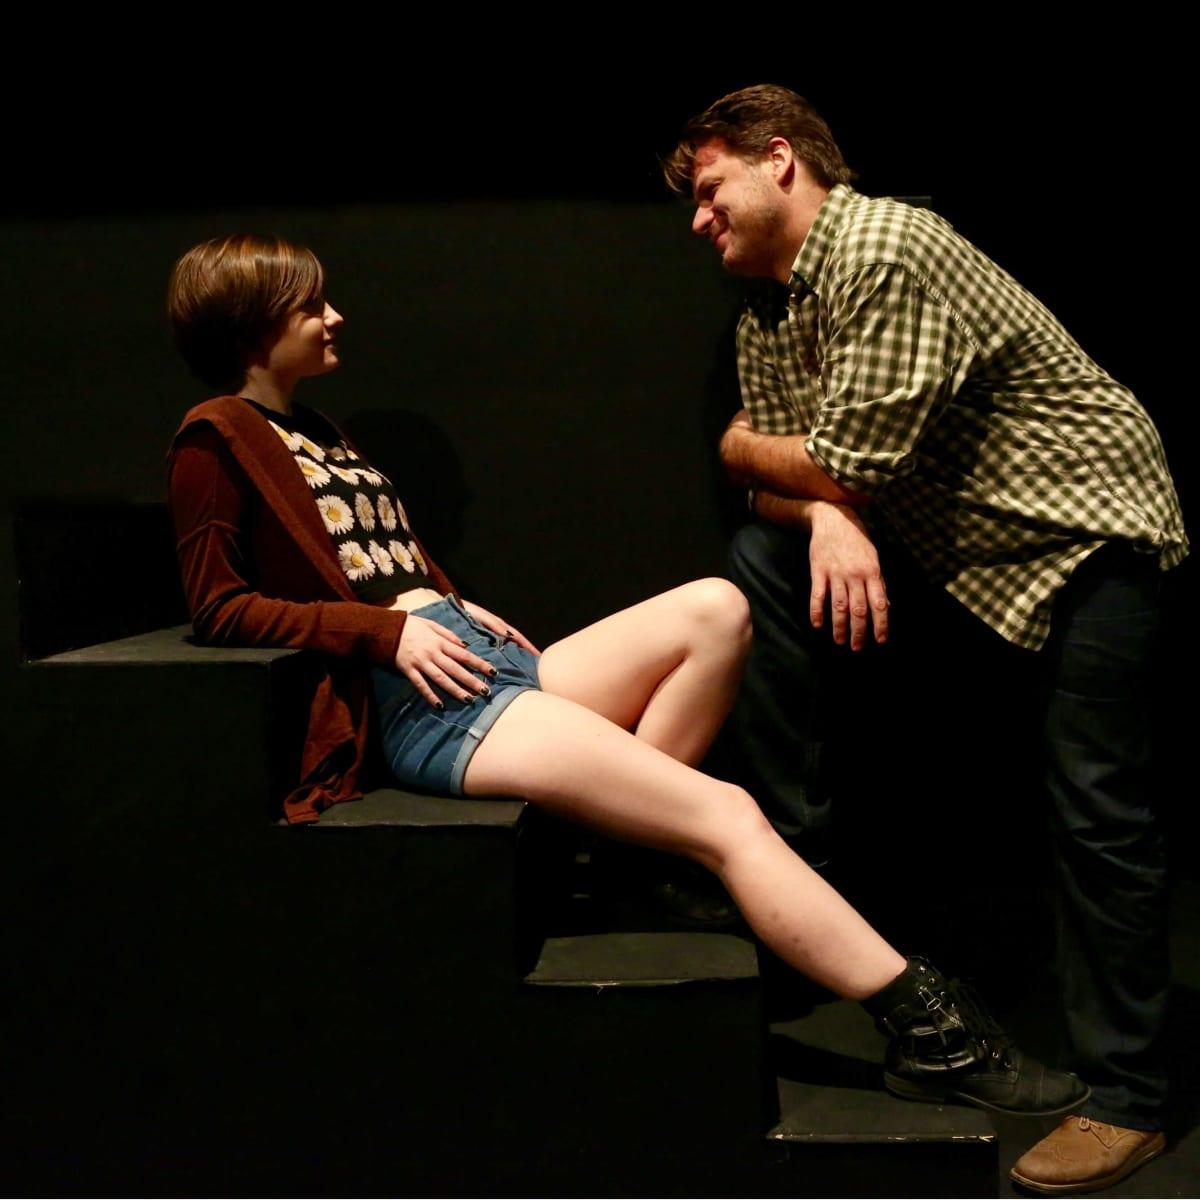 Madeleine Morris and Jeff Burleson in In a Dark Dark House